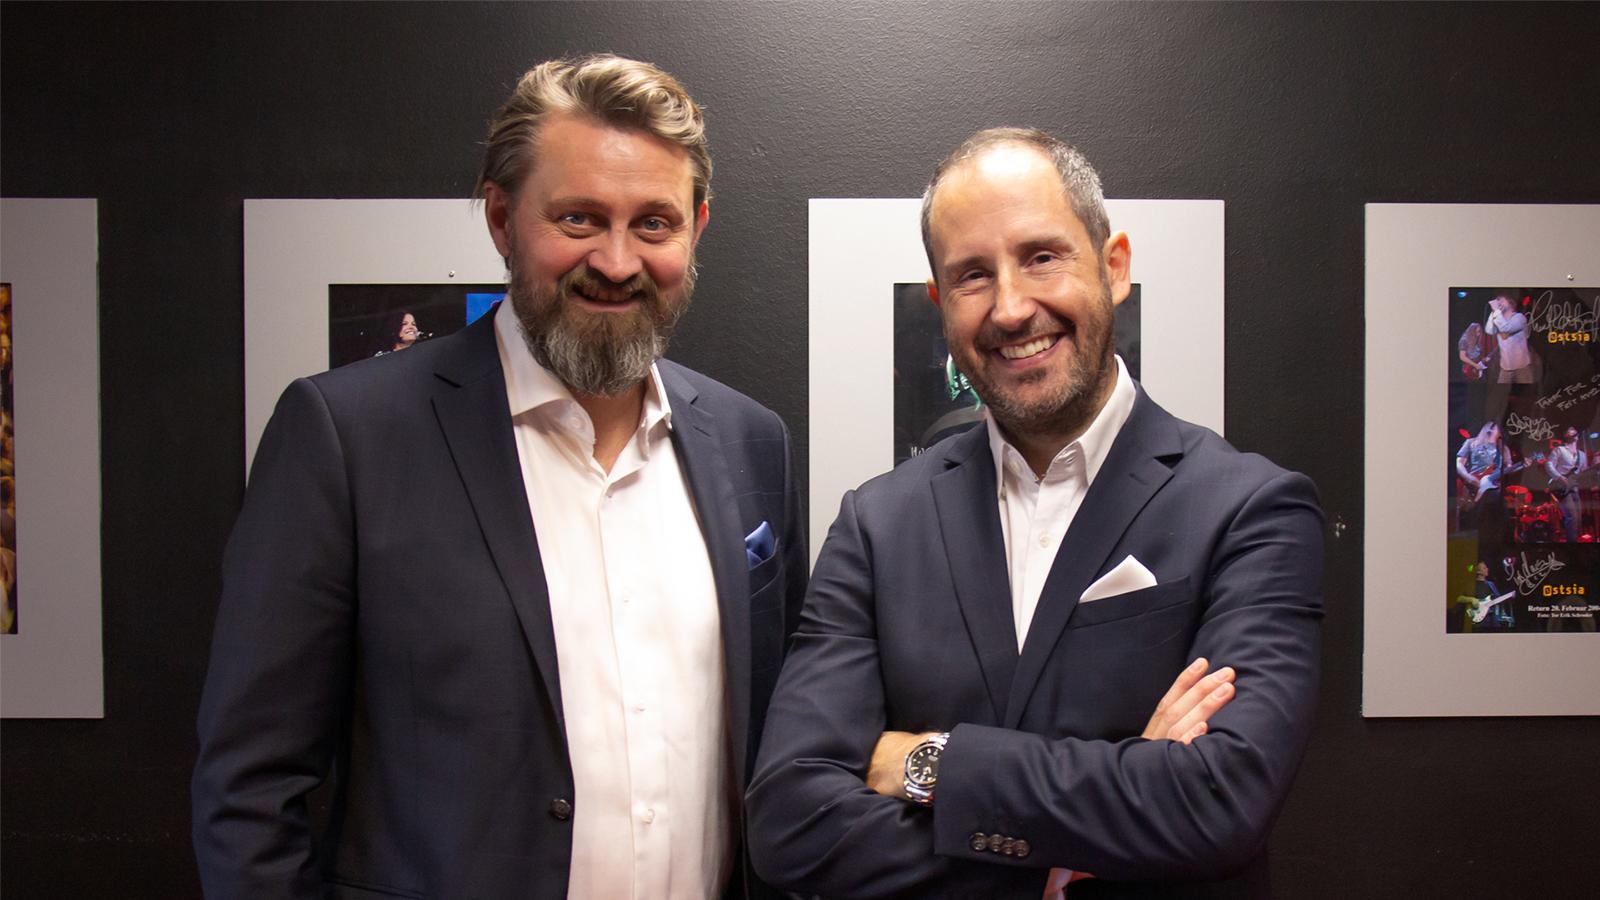 Karrieredagen 2018: Thomas og Haralds beste karrieretips